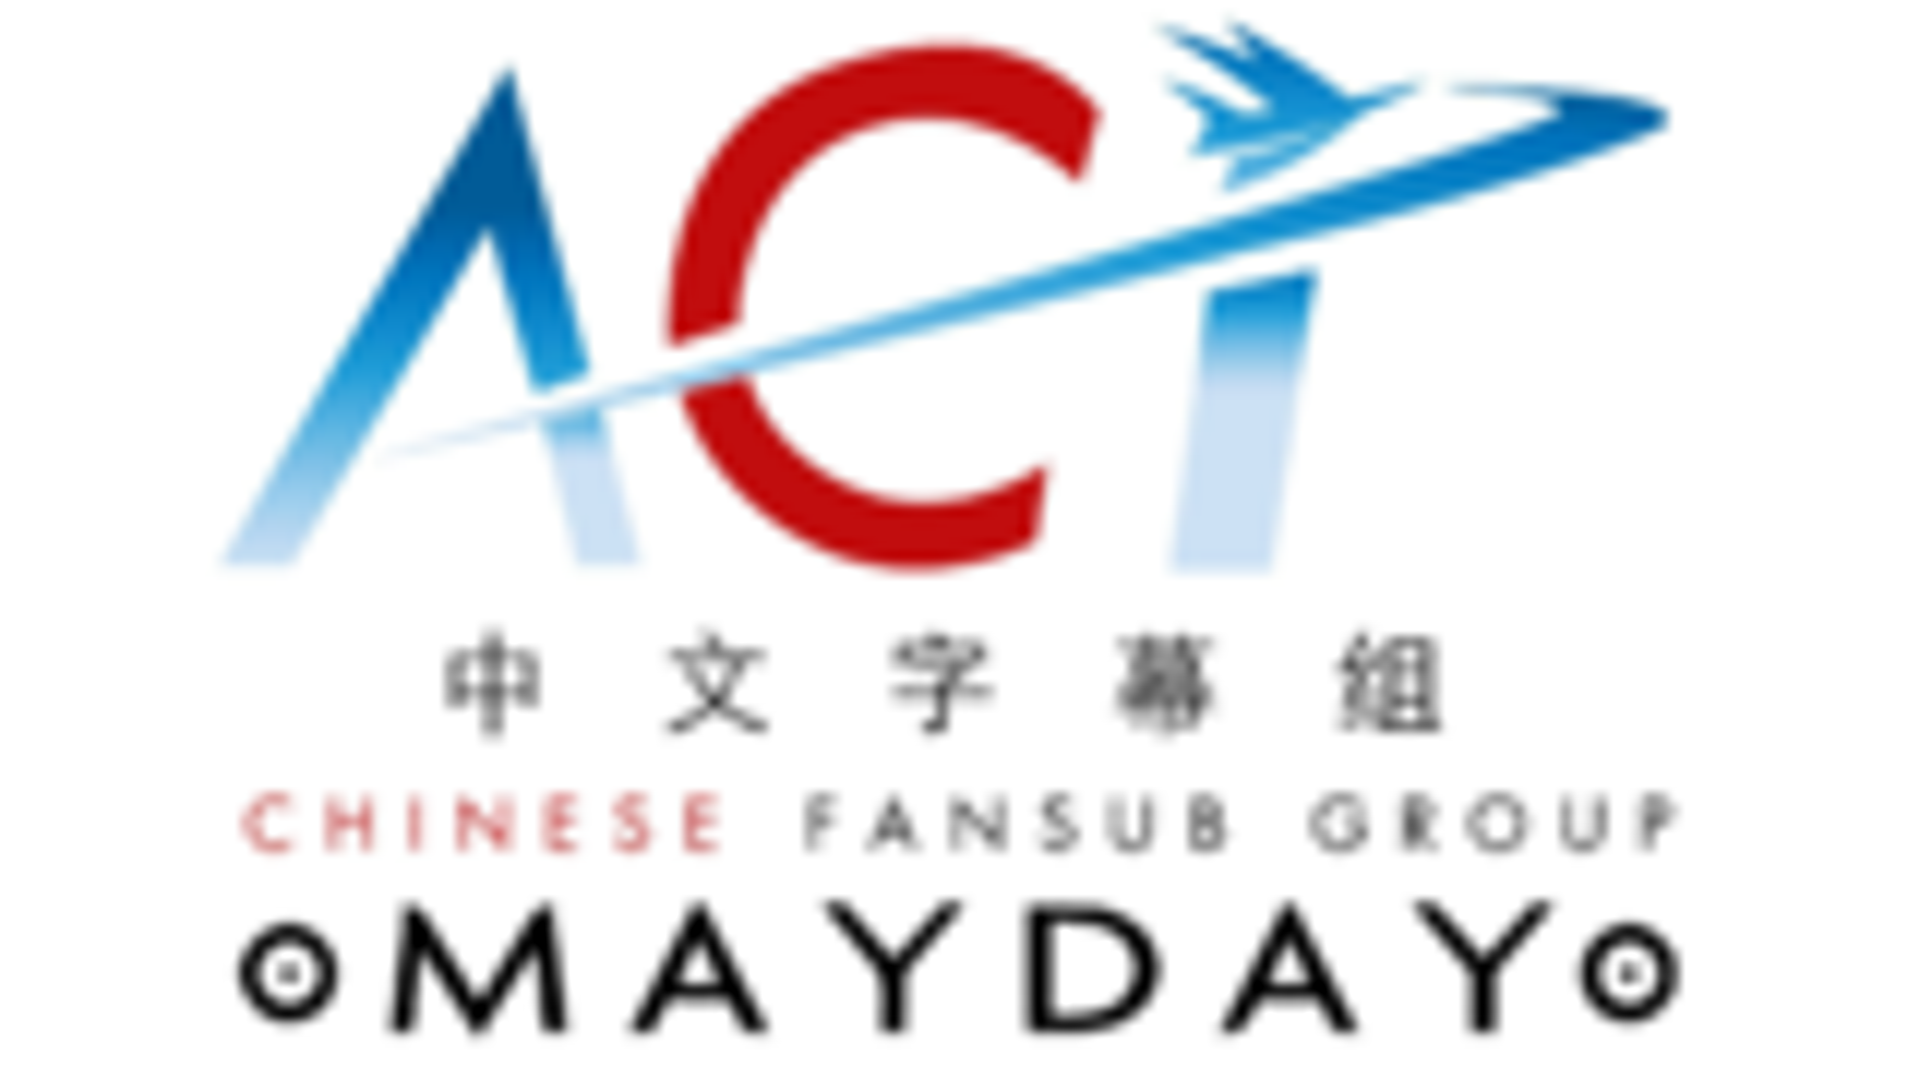 【ACICFG】空中浩劫S20E01:立荣航空873号班机(预告)